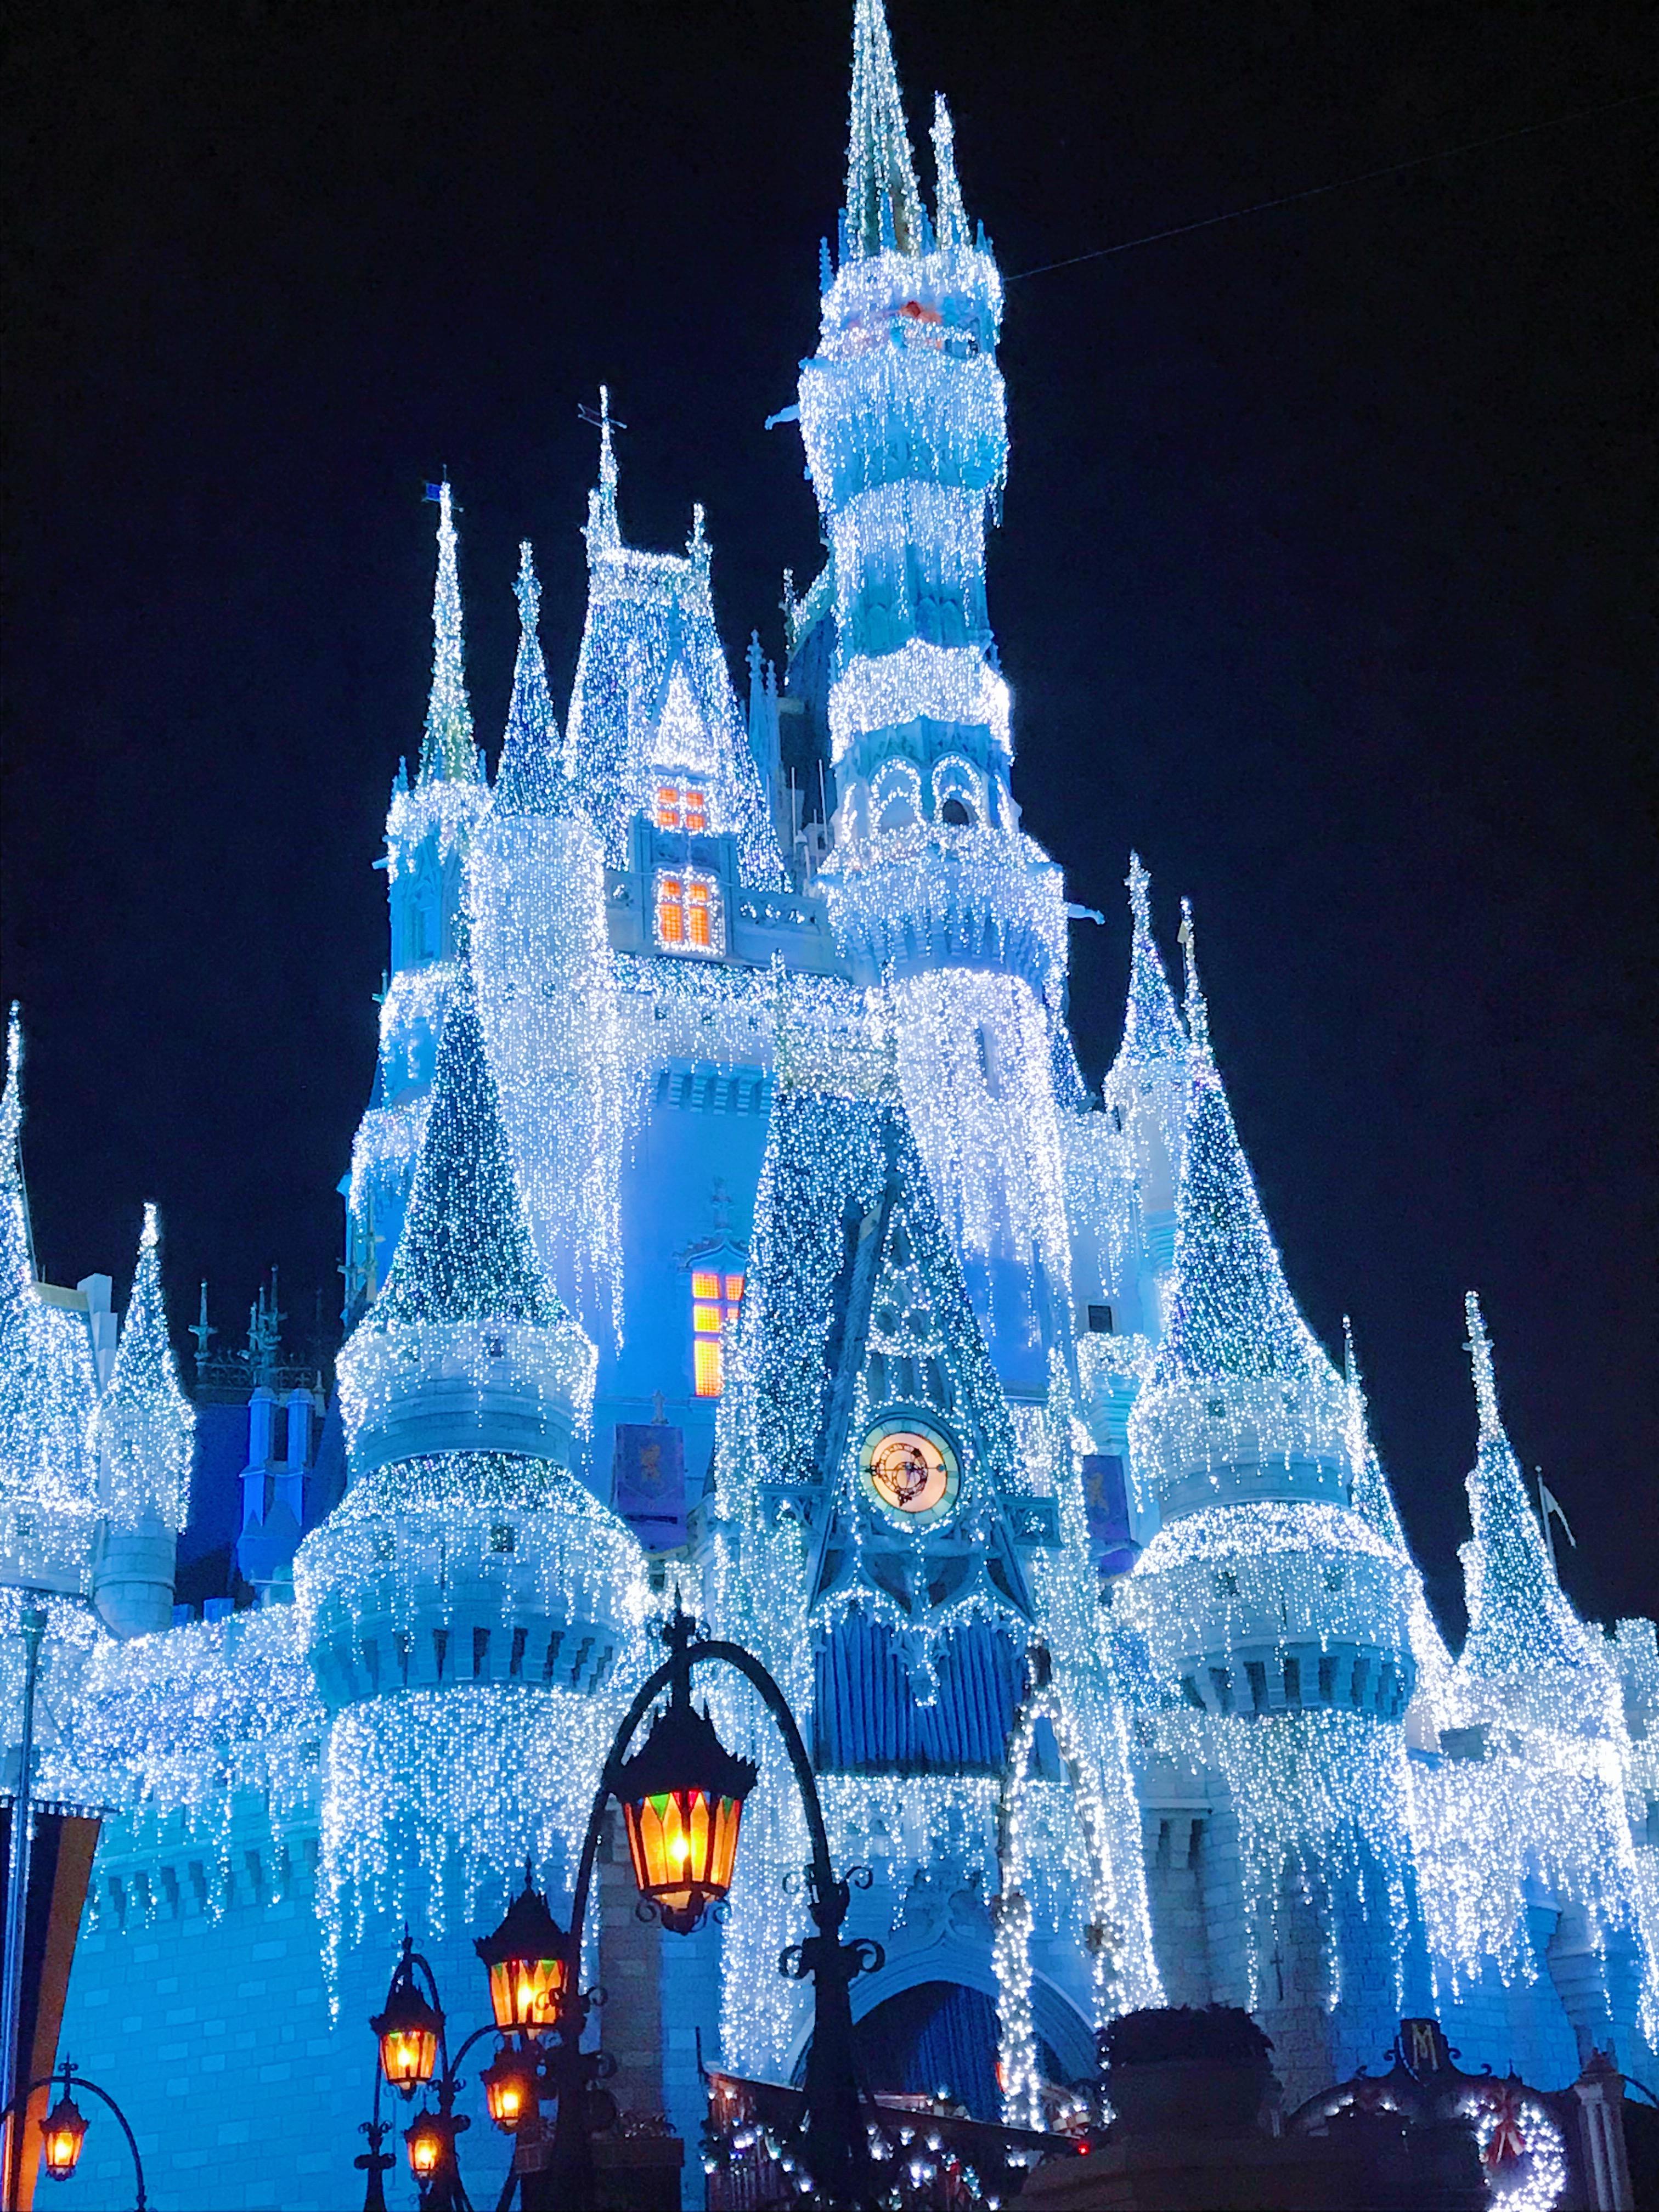 Disney Vacation Guide to Magic Kingdom